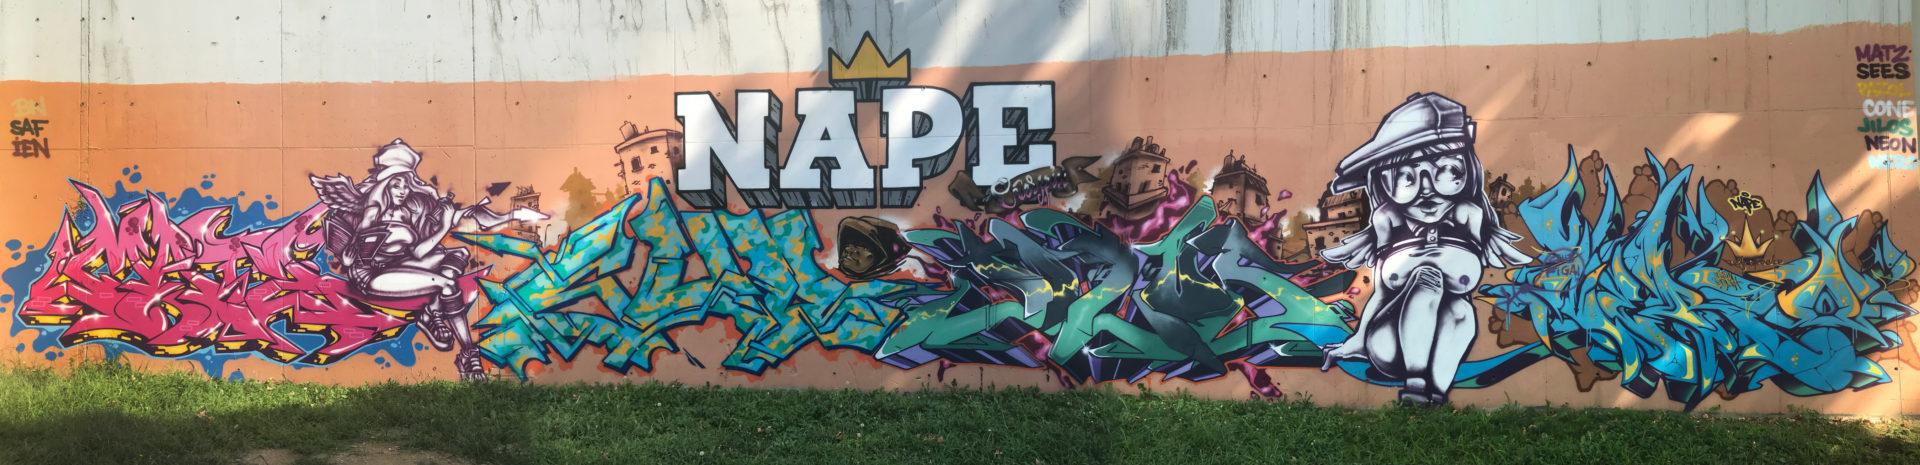 Matz + Sees + Pazol + Cone + Jilos + Neon + Nero